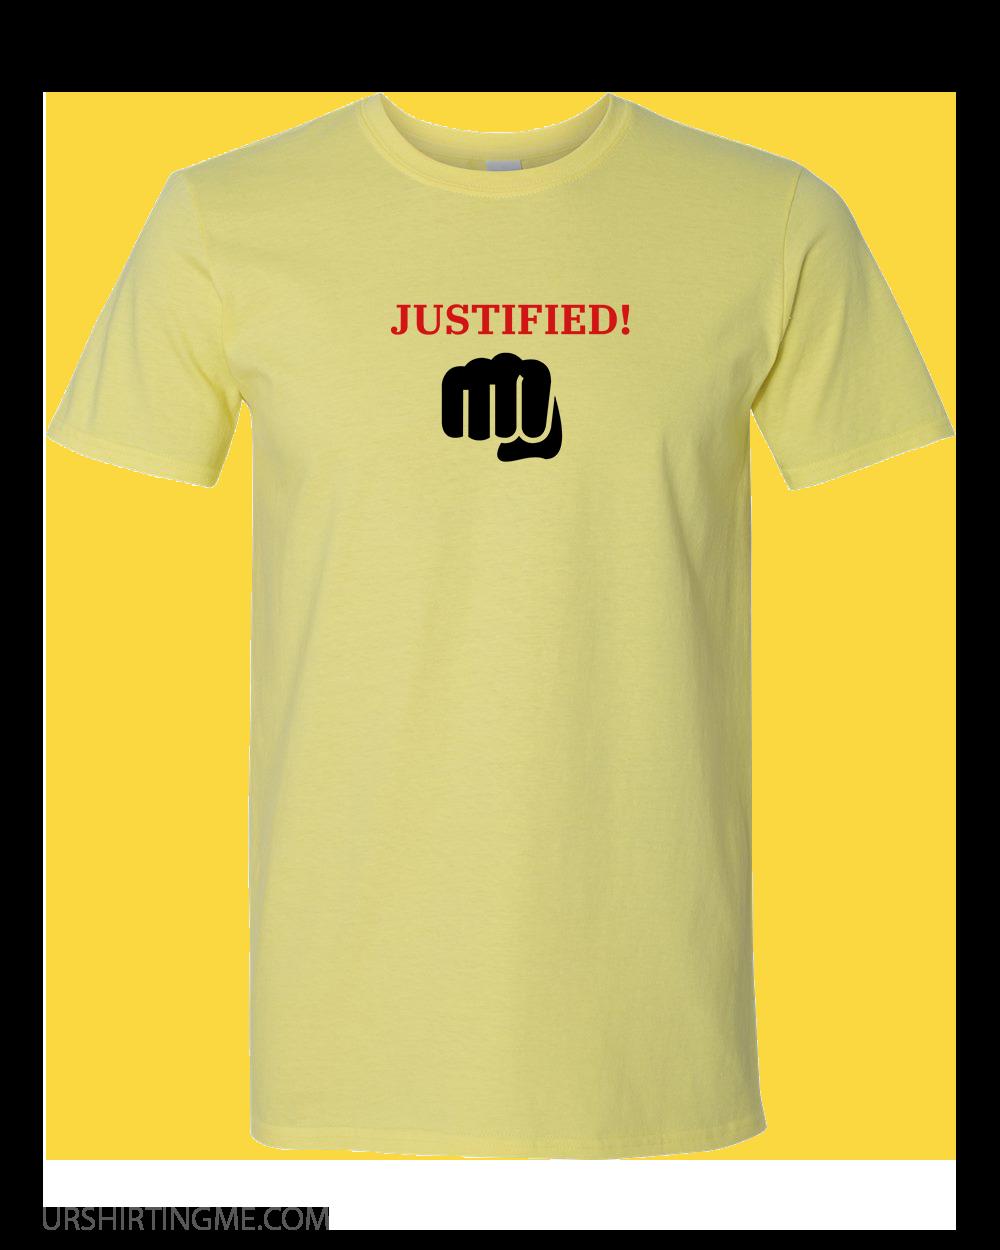 JUSTIFIED!